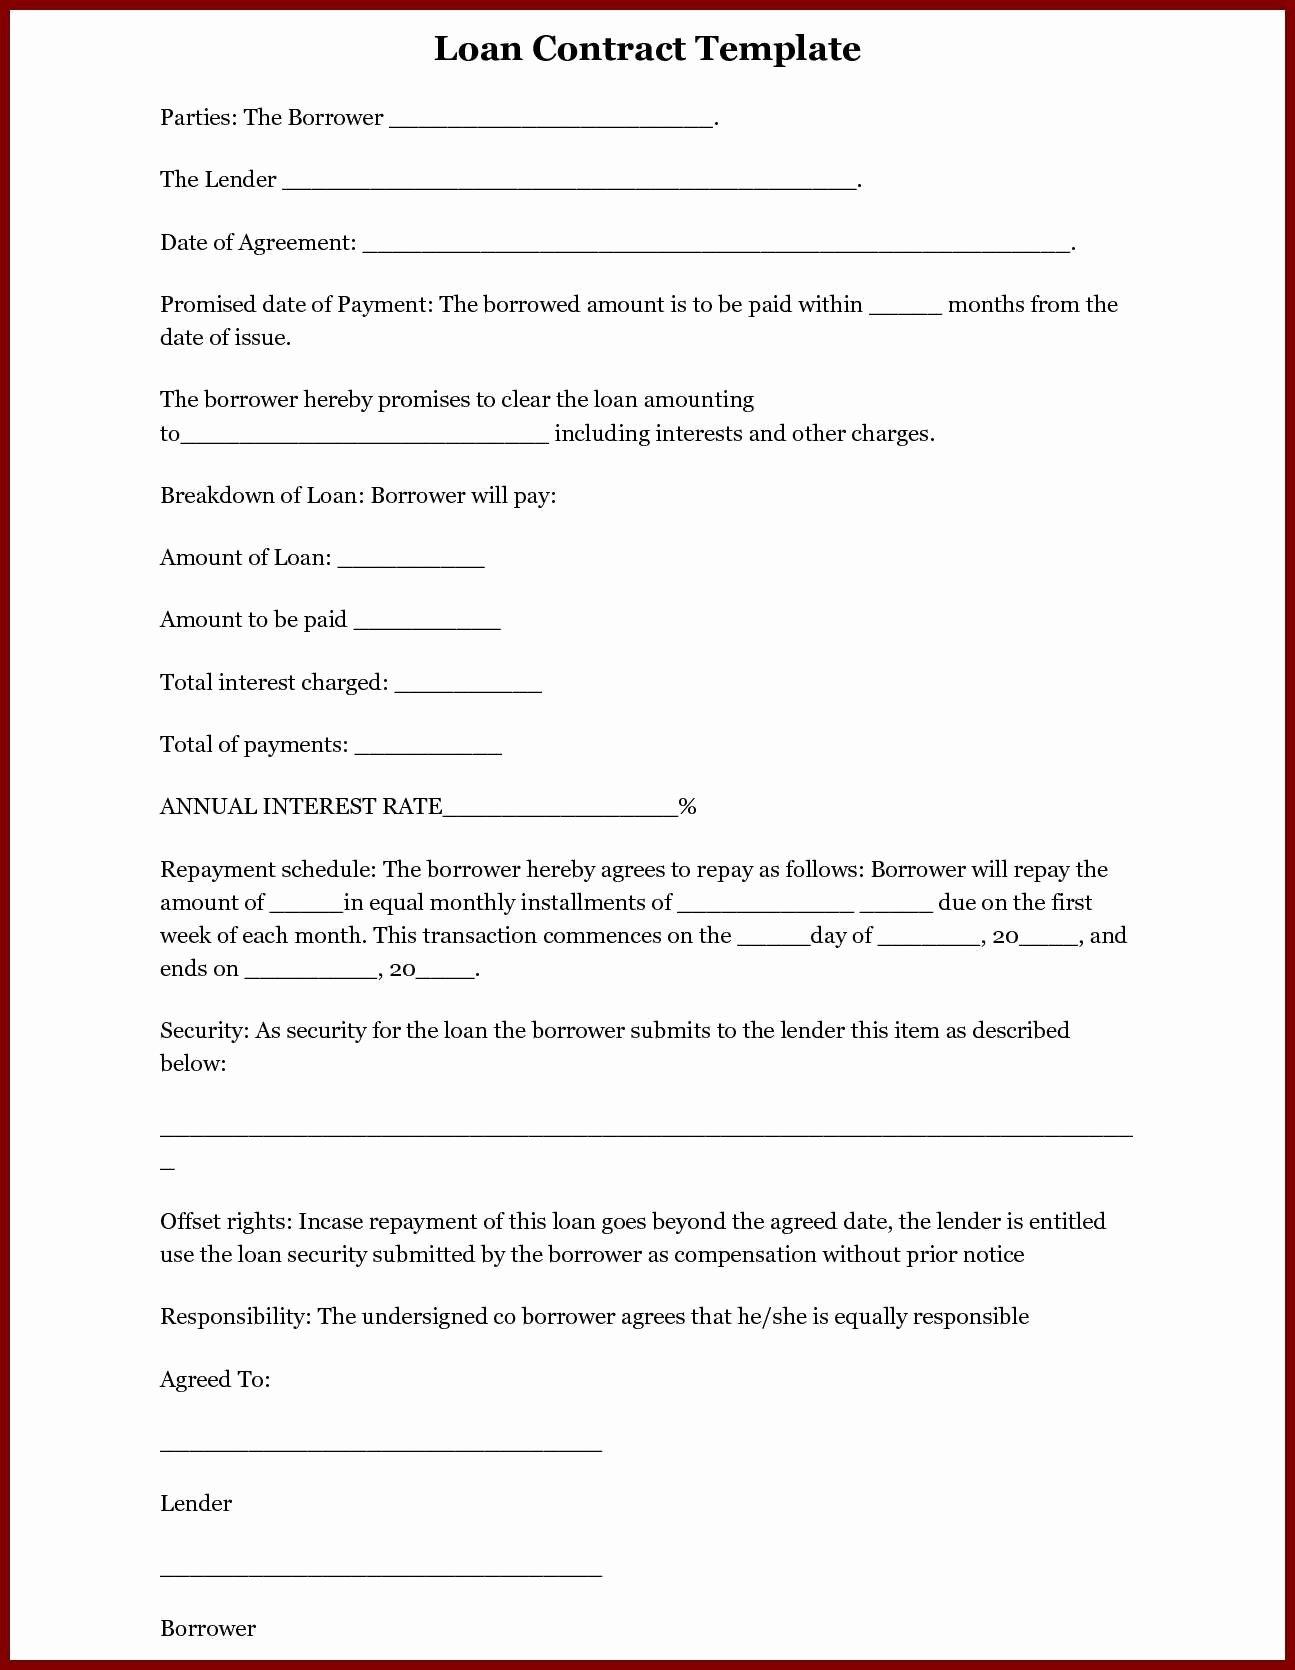 Loan Agreement Between Friends Template Lovely 40 Excellent Loan Agreement Letter Between Friends Wu